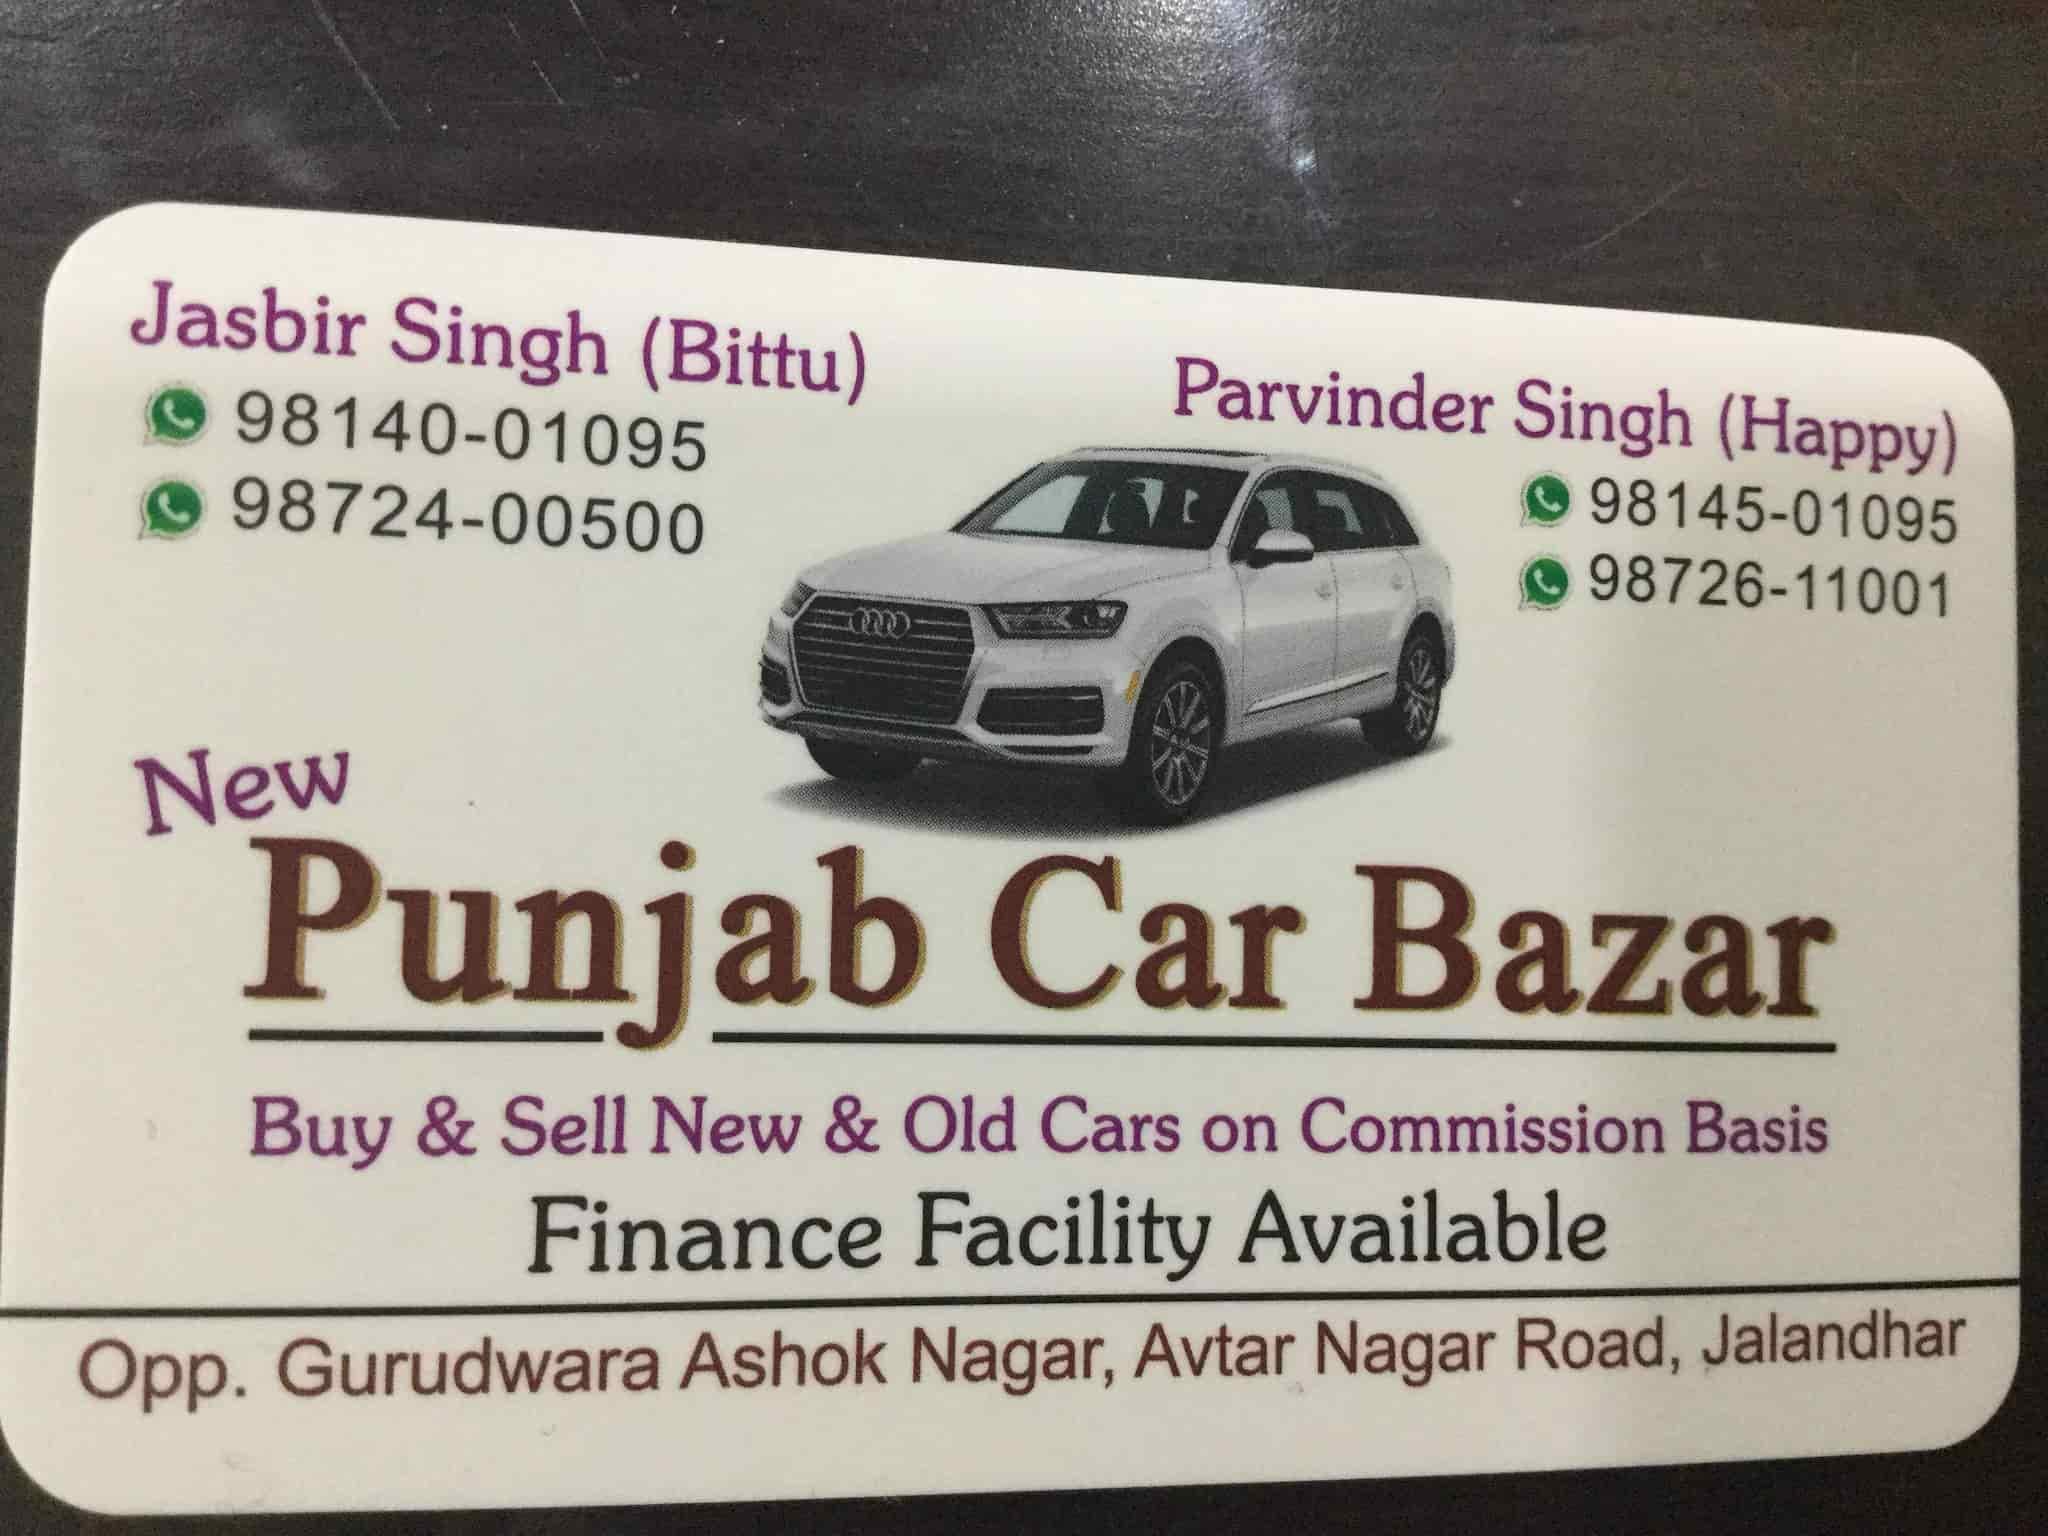 Punjab India Vehicle Registration Owner Verification System - The ...